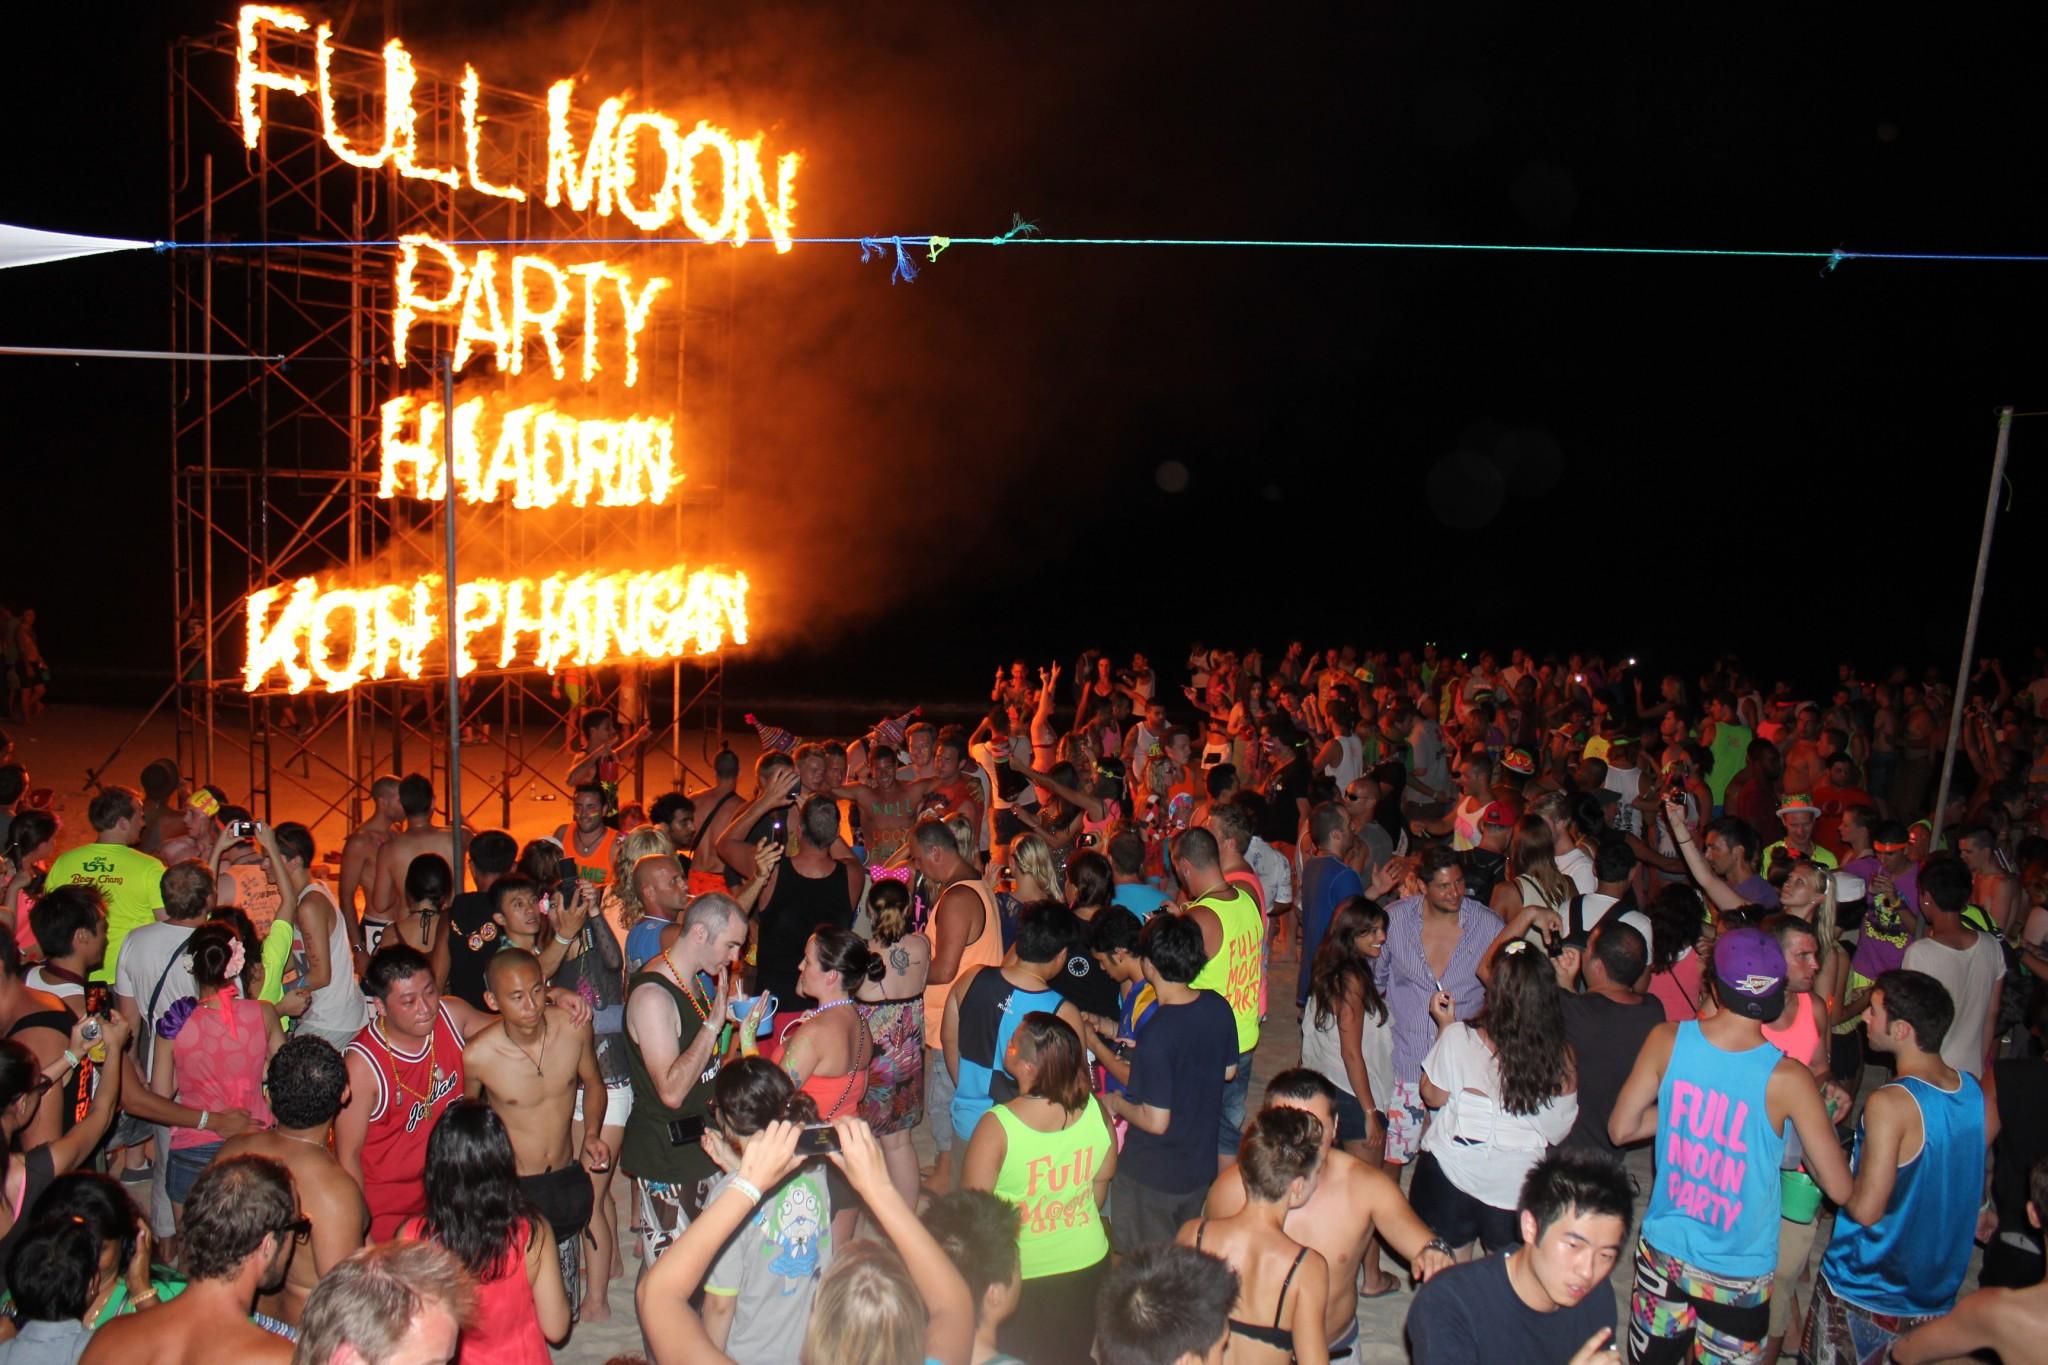 Full Moon Party Thailand Koh Phangan